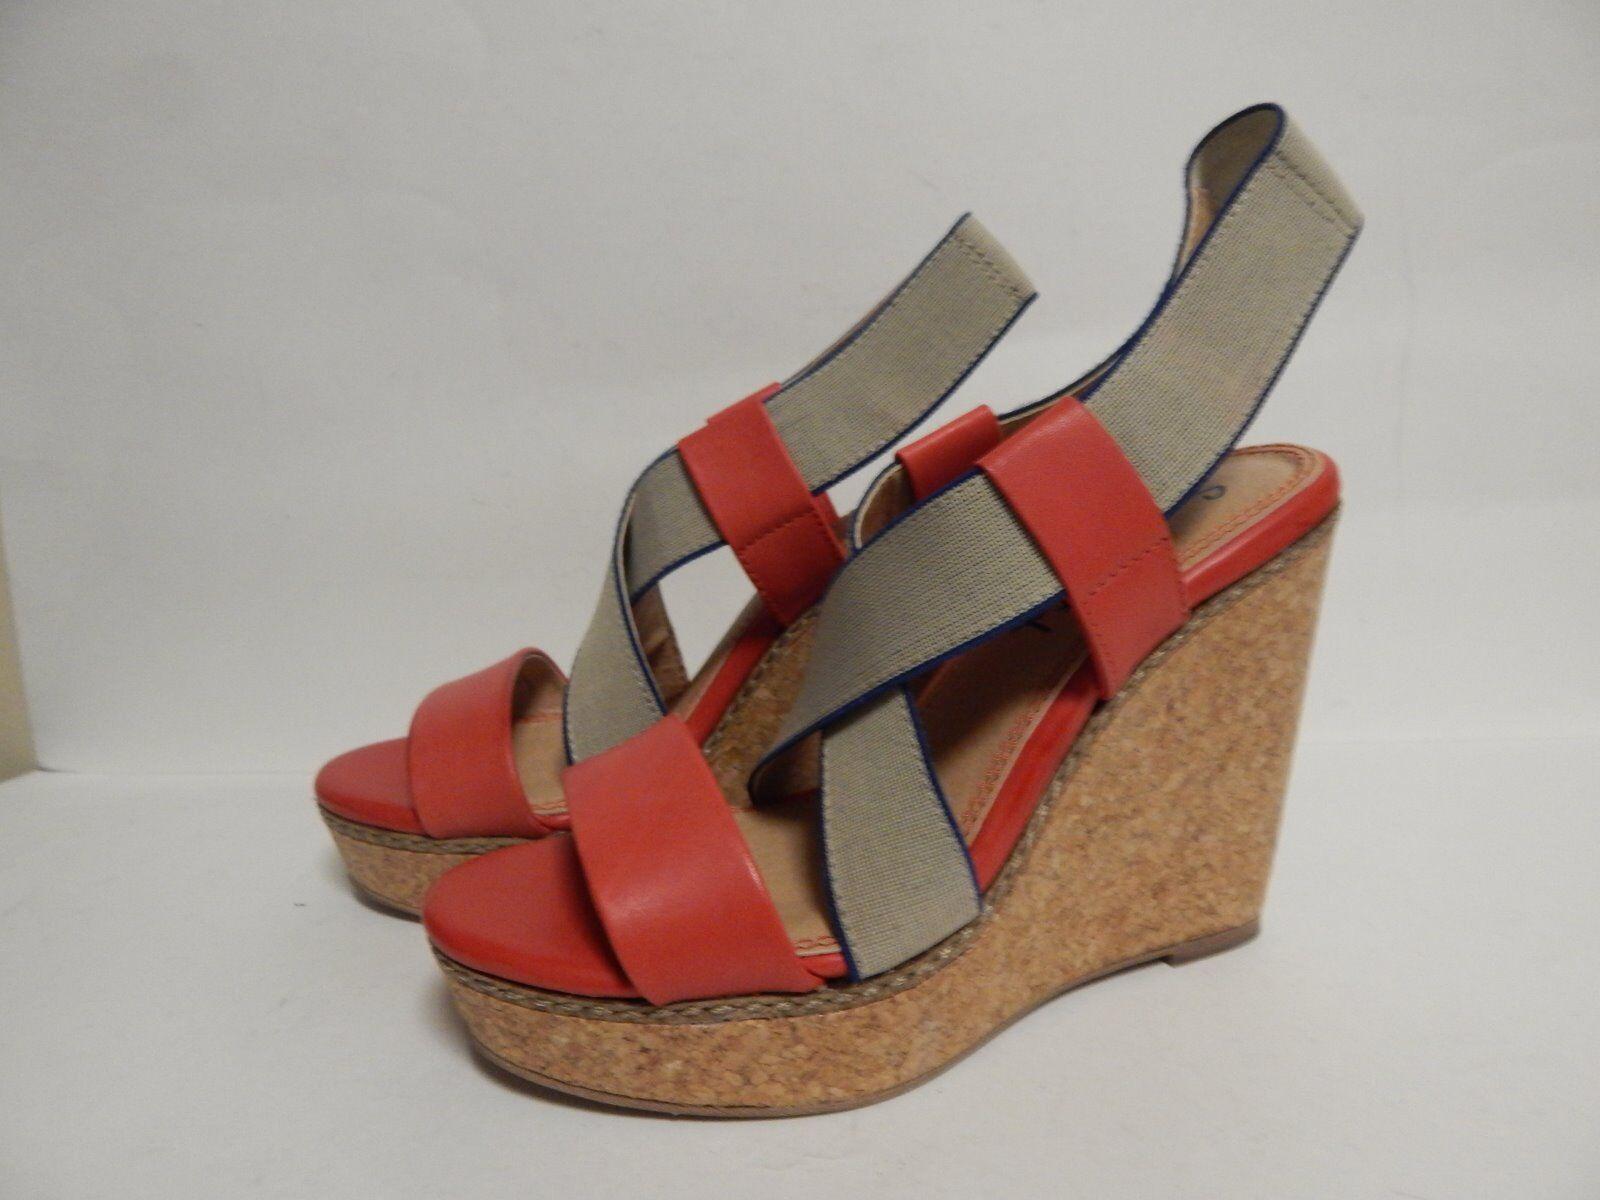 Splendid Kellen Wedge Heel Sandal 7 M Strawberry Leather  New with Box